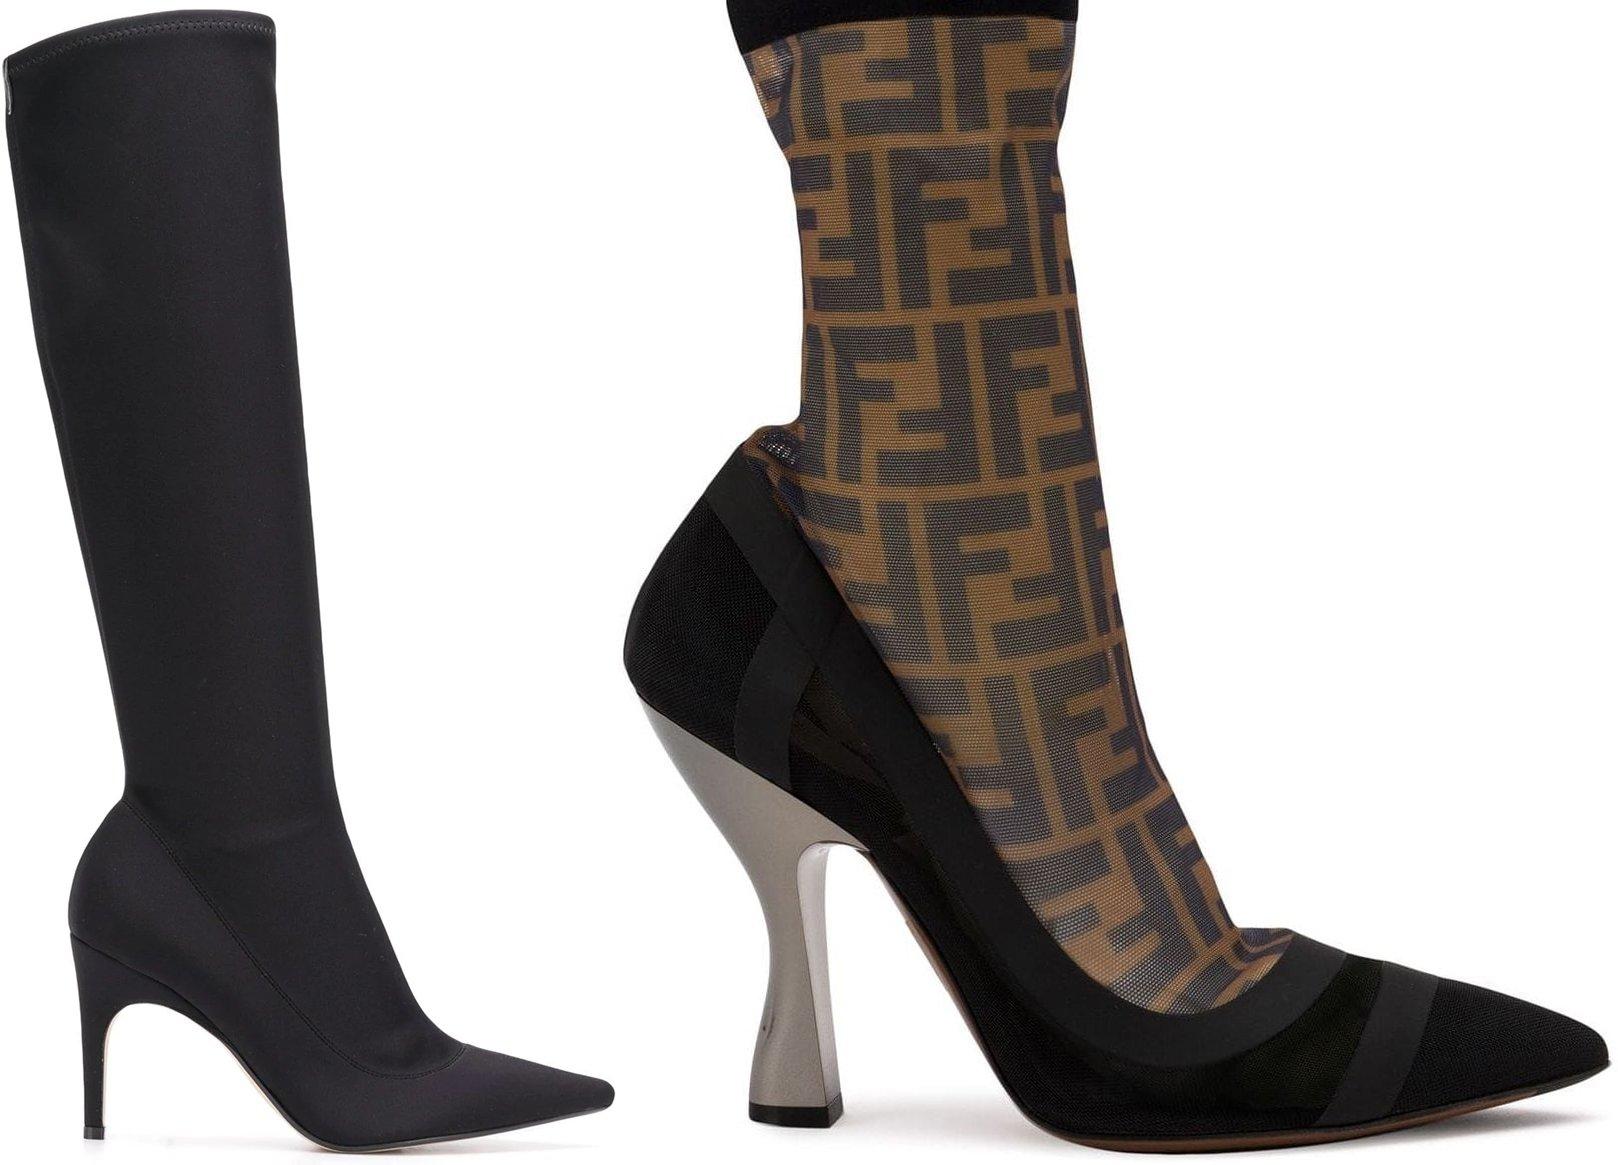 Sergio Rossi Kit sock boots and Fendi Colibrì FF motif sock boots